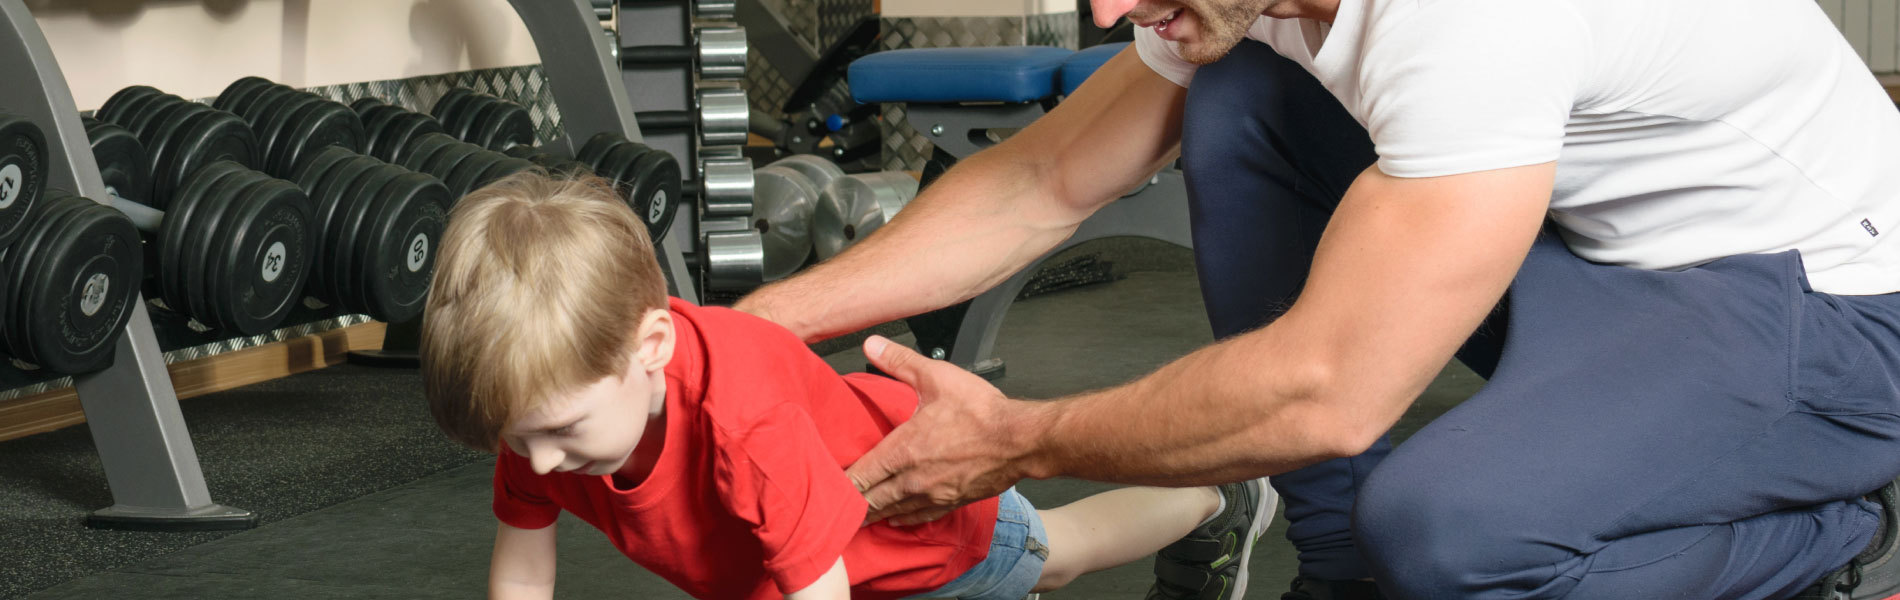 5_Tips_for_Getting_Children_Starting_Fitness_Early_1900x600.jpg